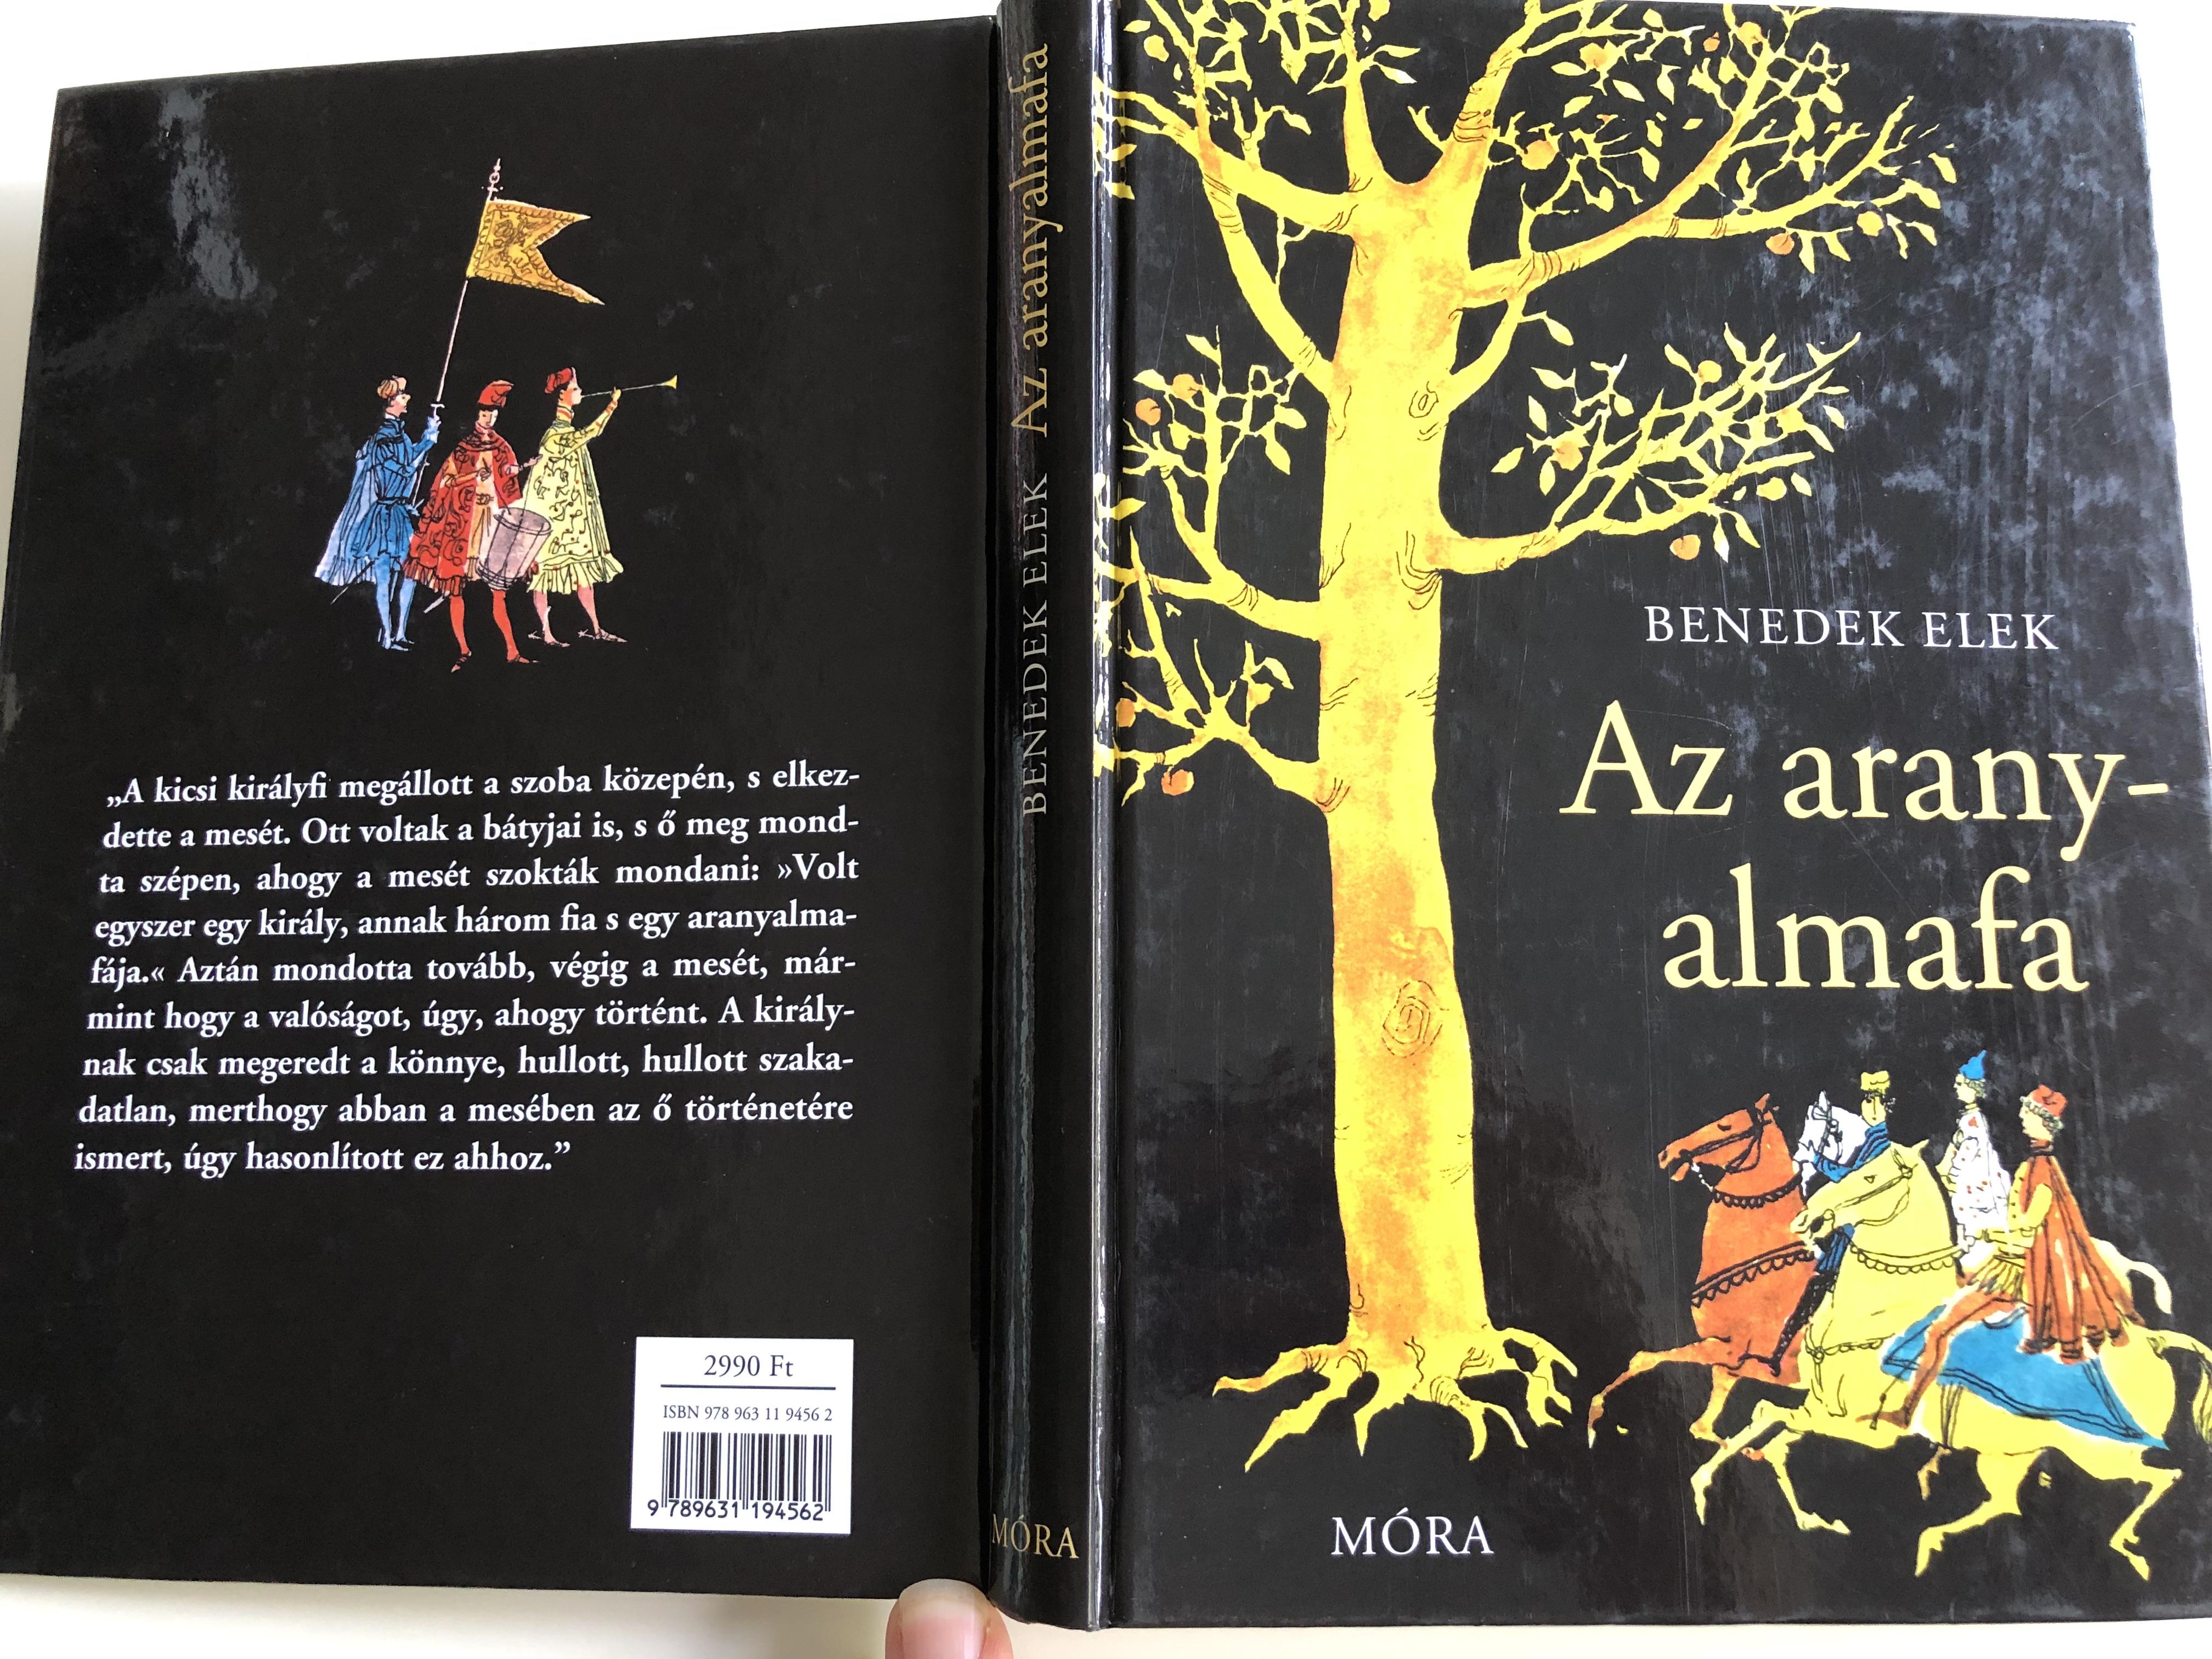 az-aranyalmafa-by-benedek-elek-foreign-stories-in-hungarian-language-7th-edition-illustrations-szecsk-tam-s-m-ra-k-nyvkiad-2013-9-.jpg